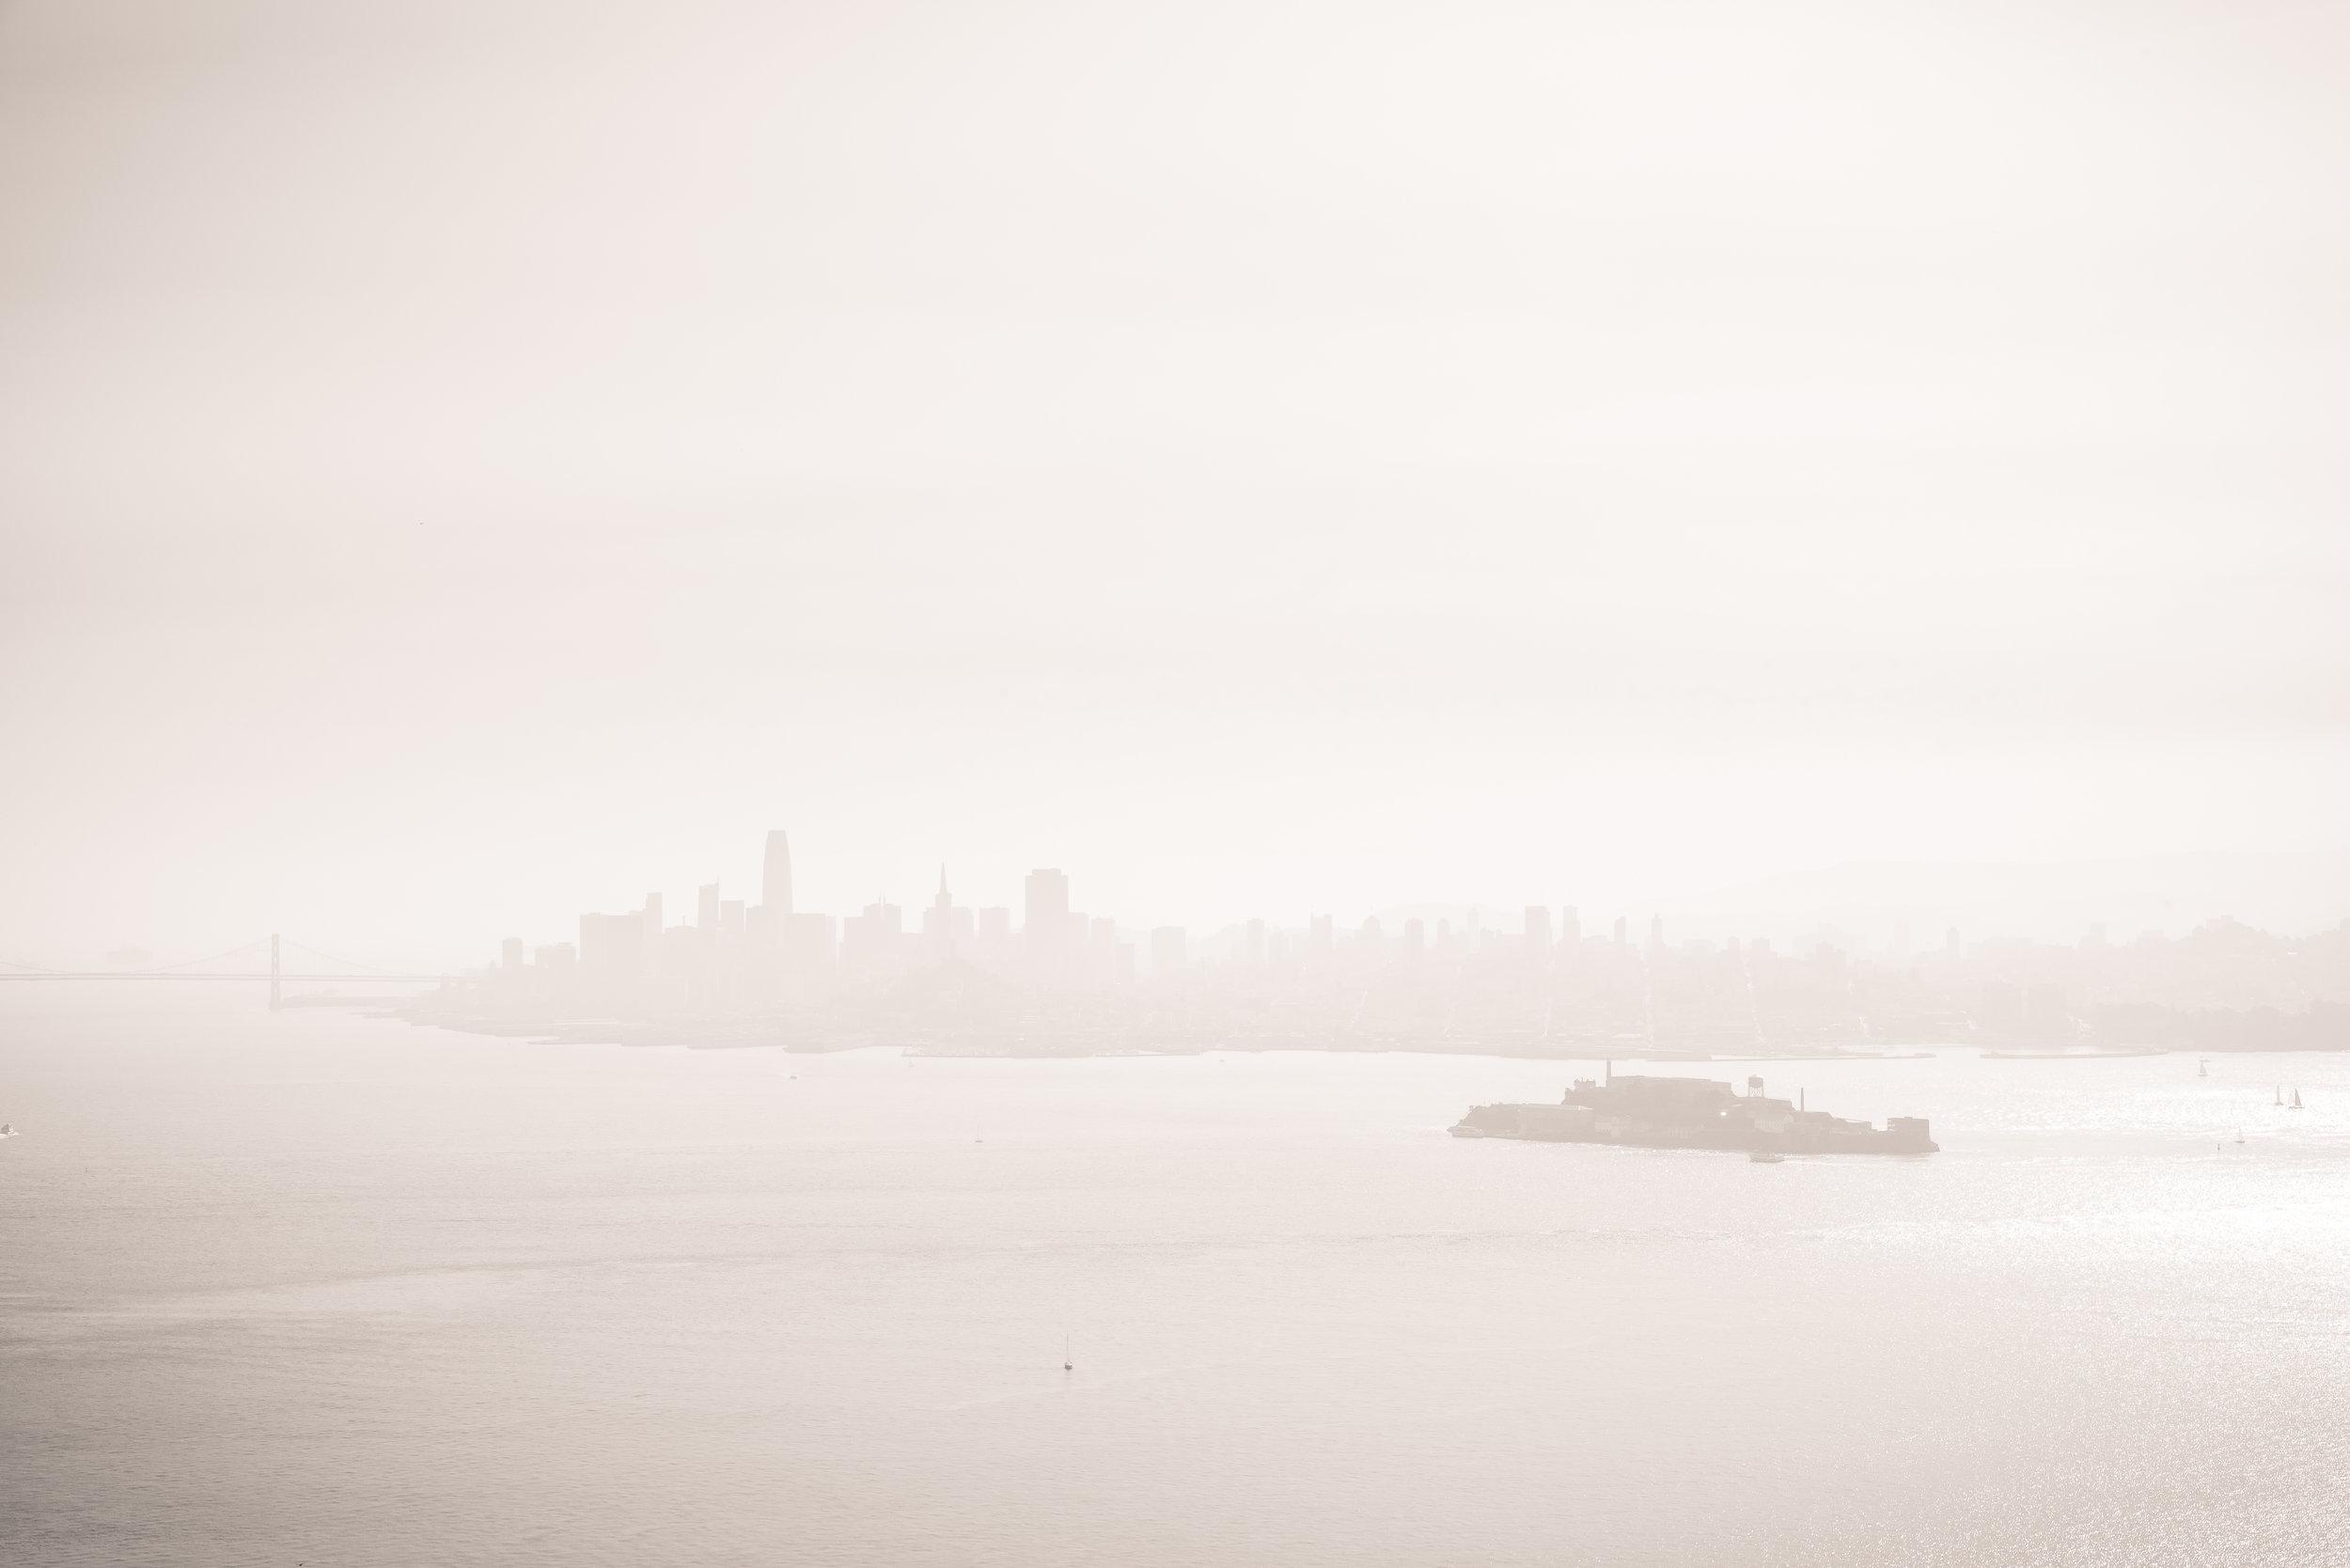 Angel Island / California